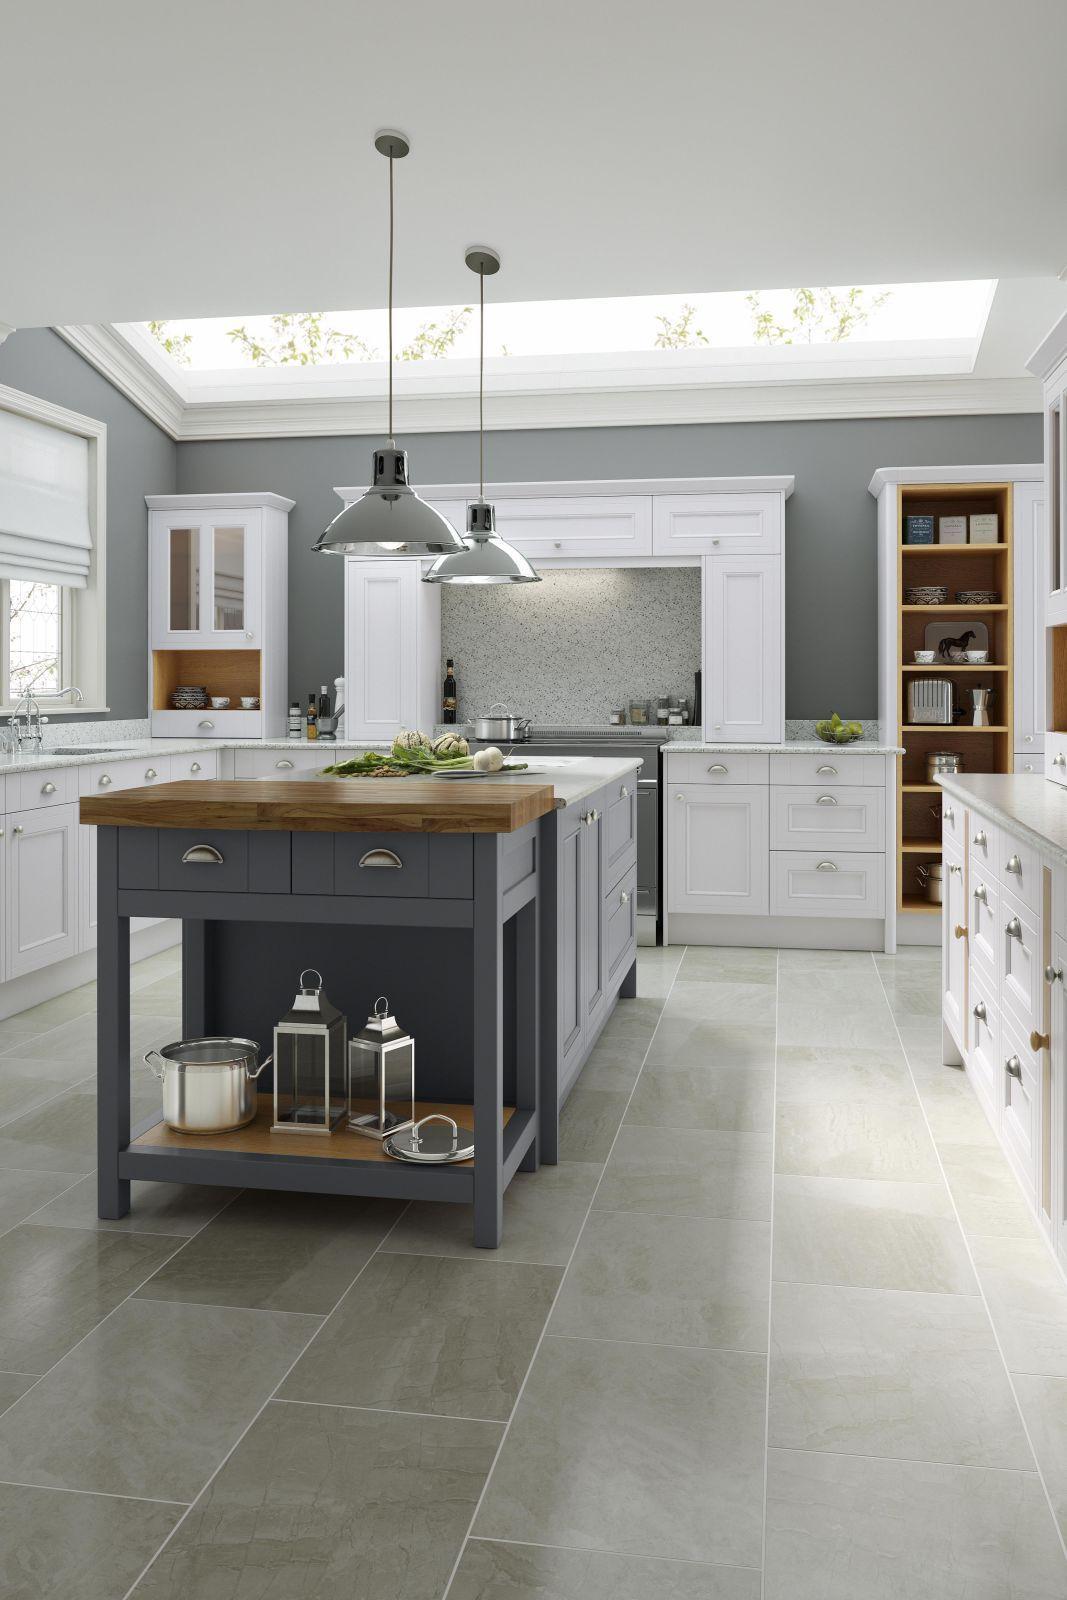 Country Kitchen in Chalk White & Castle Rock Wren